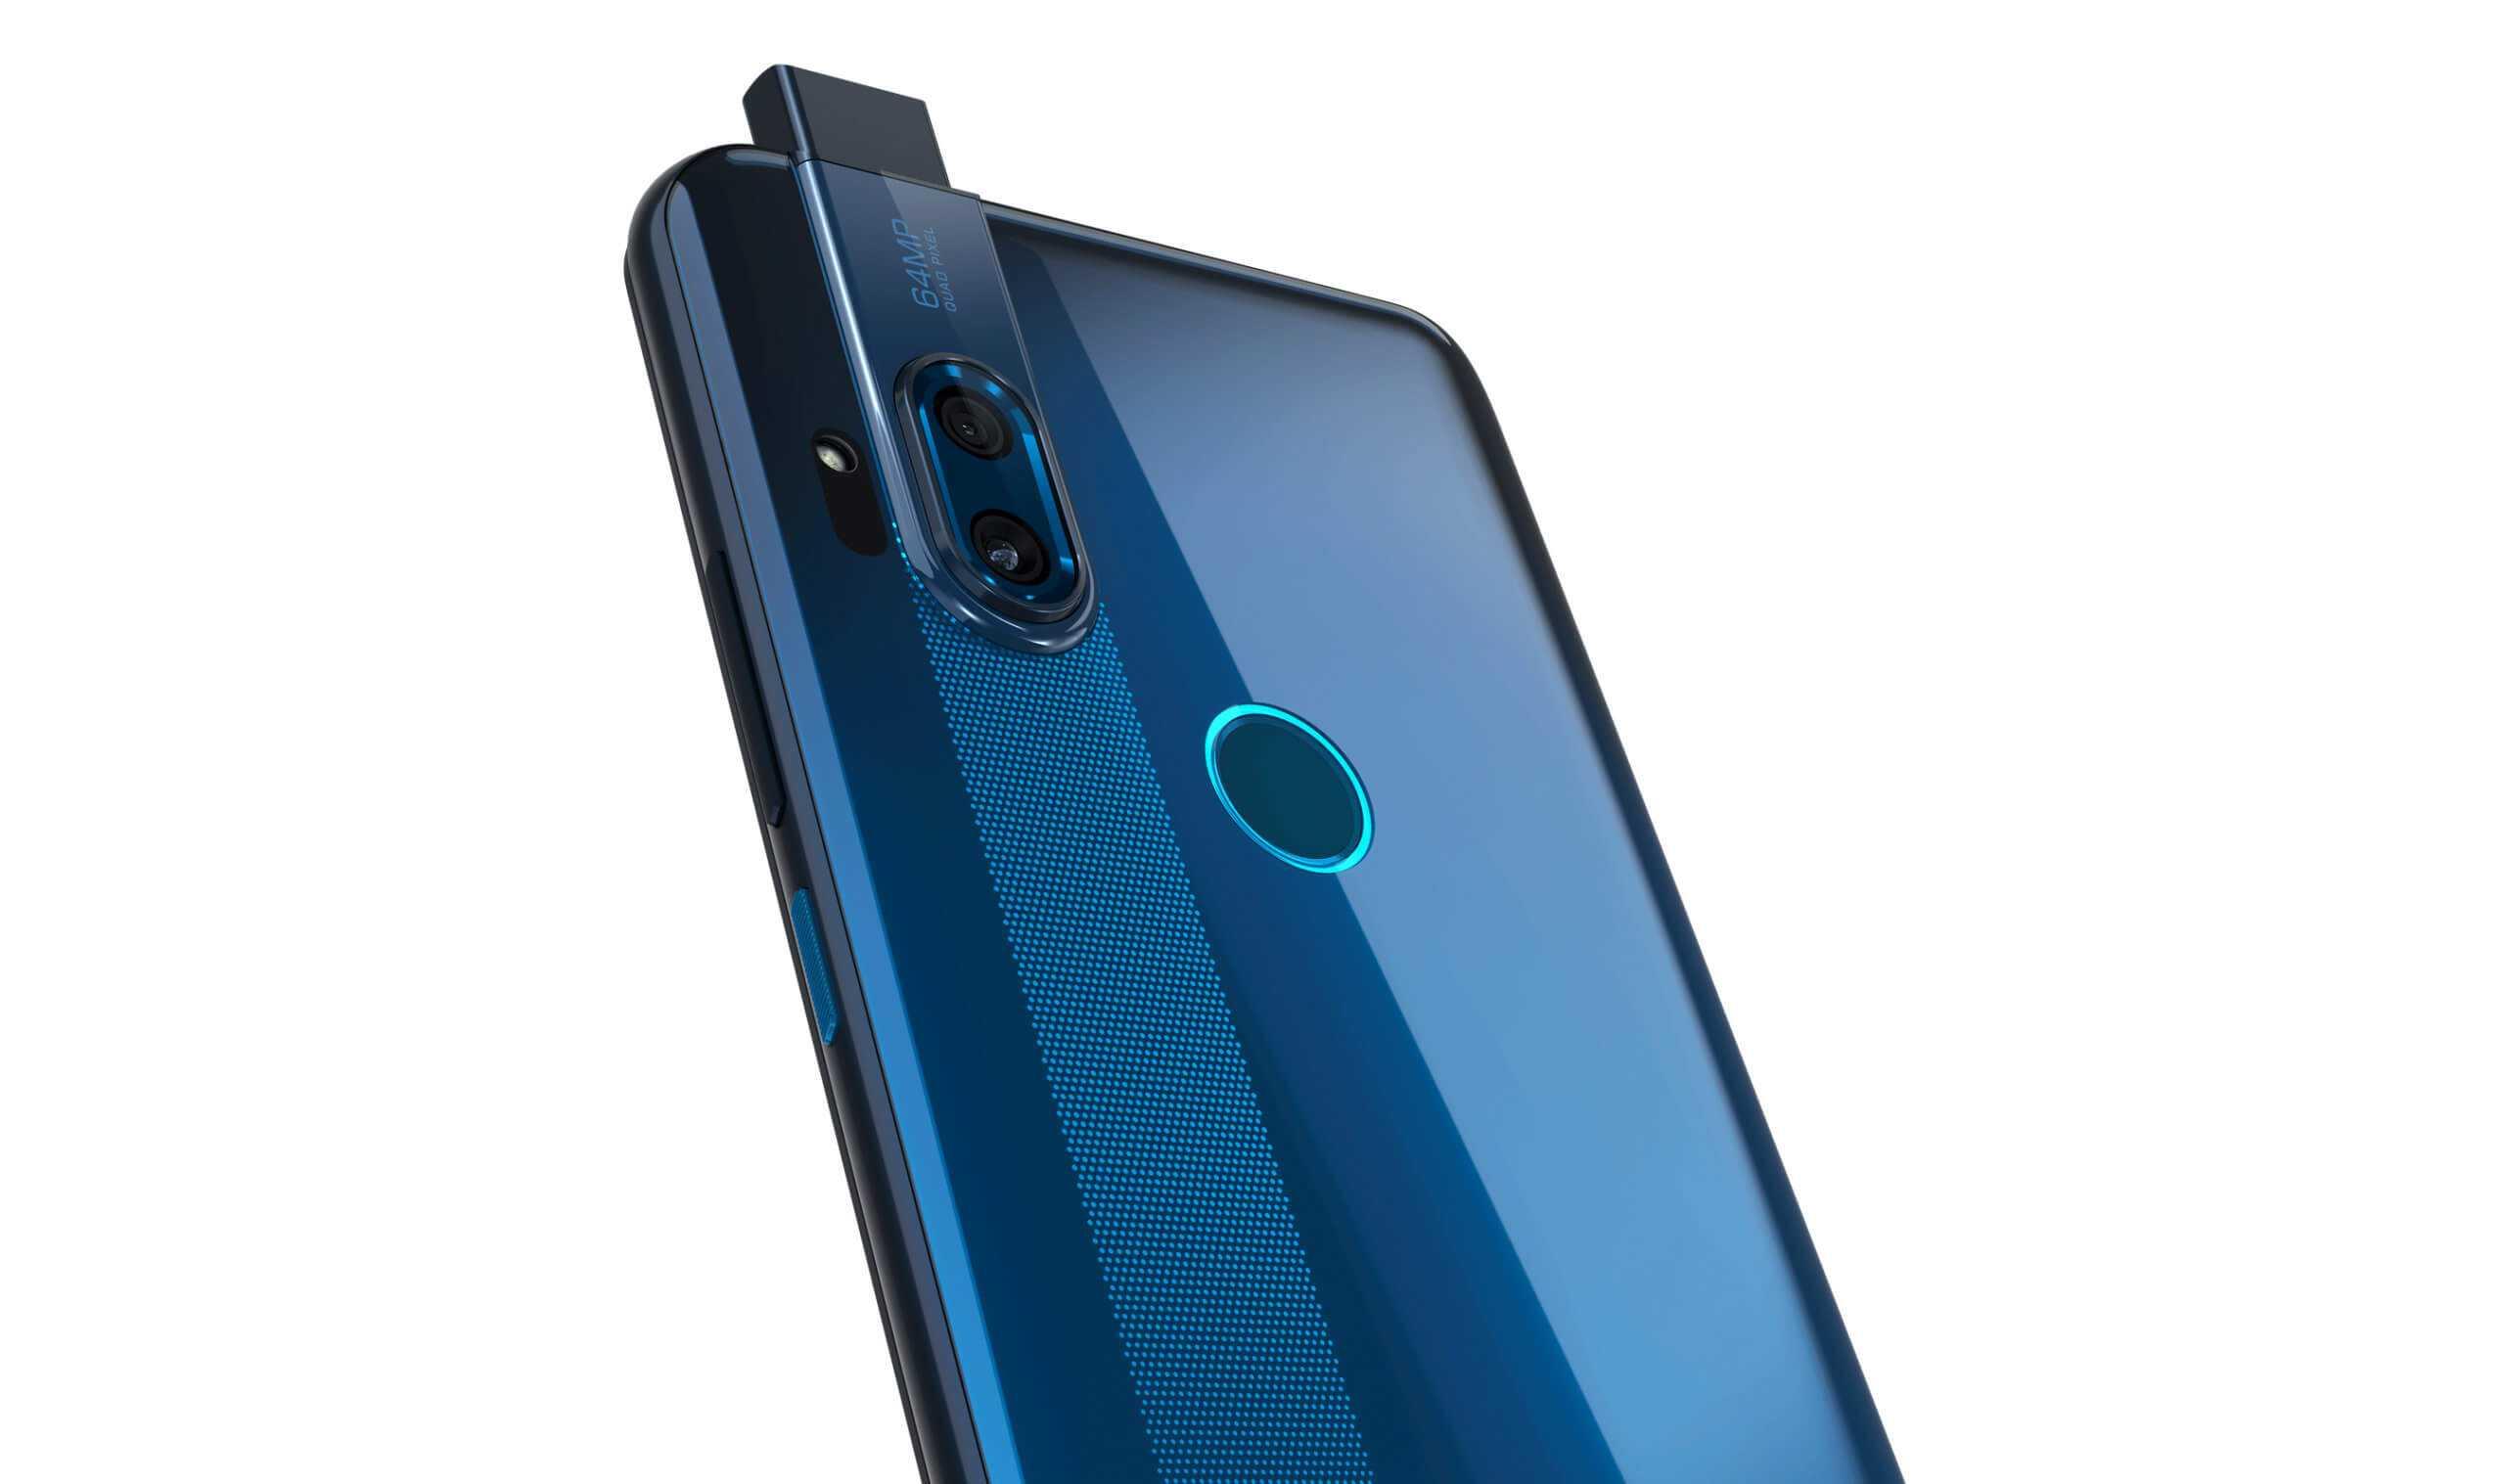 Самая странная камера смартфона получила престижную награду. нужна ли нам такая? - androidinsider.ru